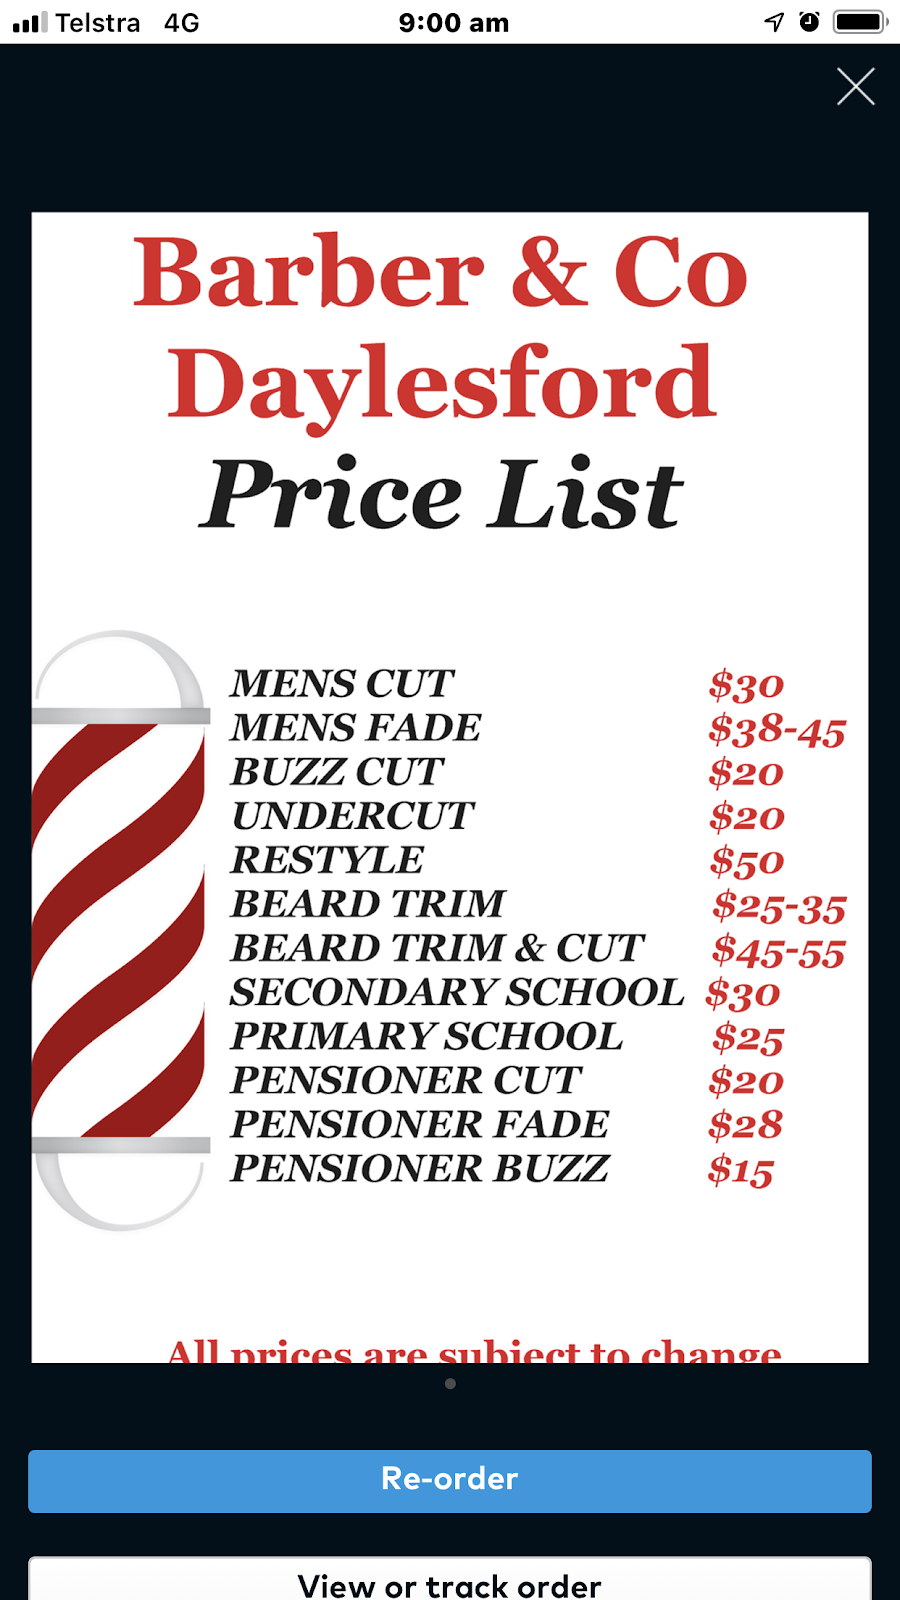 Barber & Co Daylesford   hair care   30 Albert St, Daylesford VIC 3460, Australia   0448722814 OR +61 448 722 814